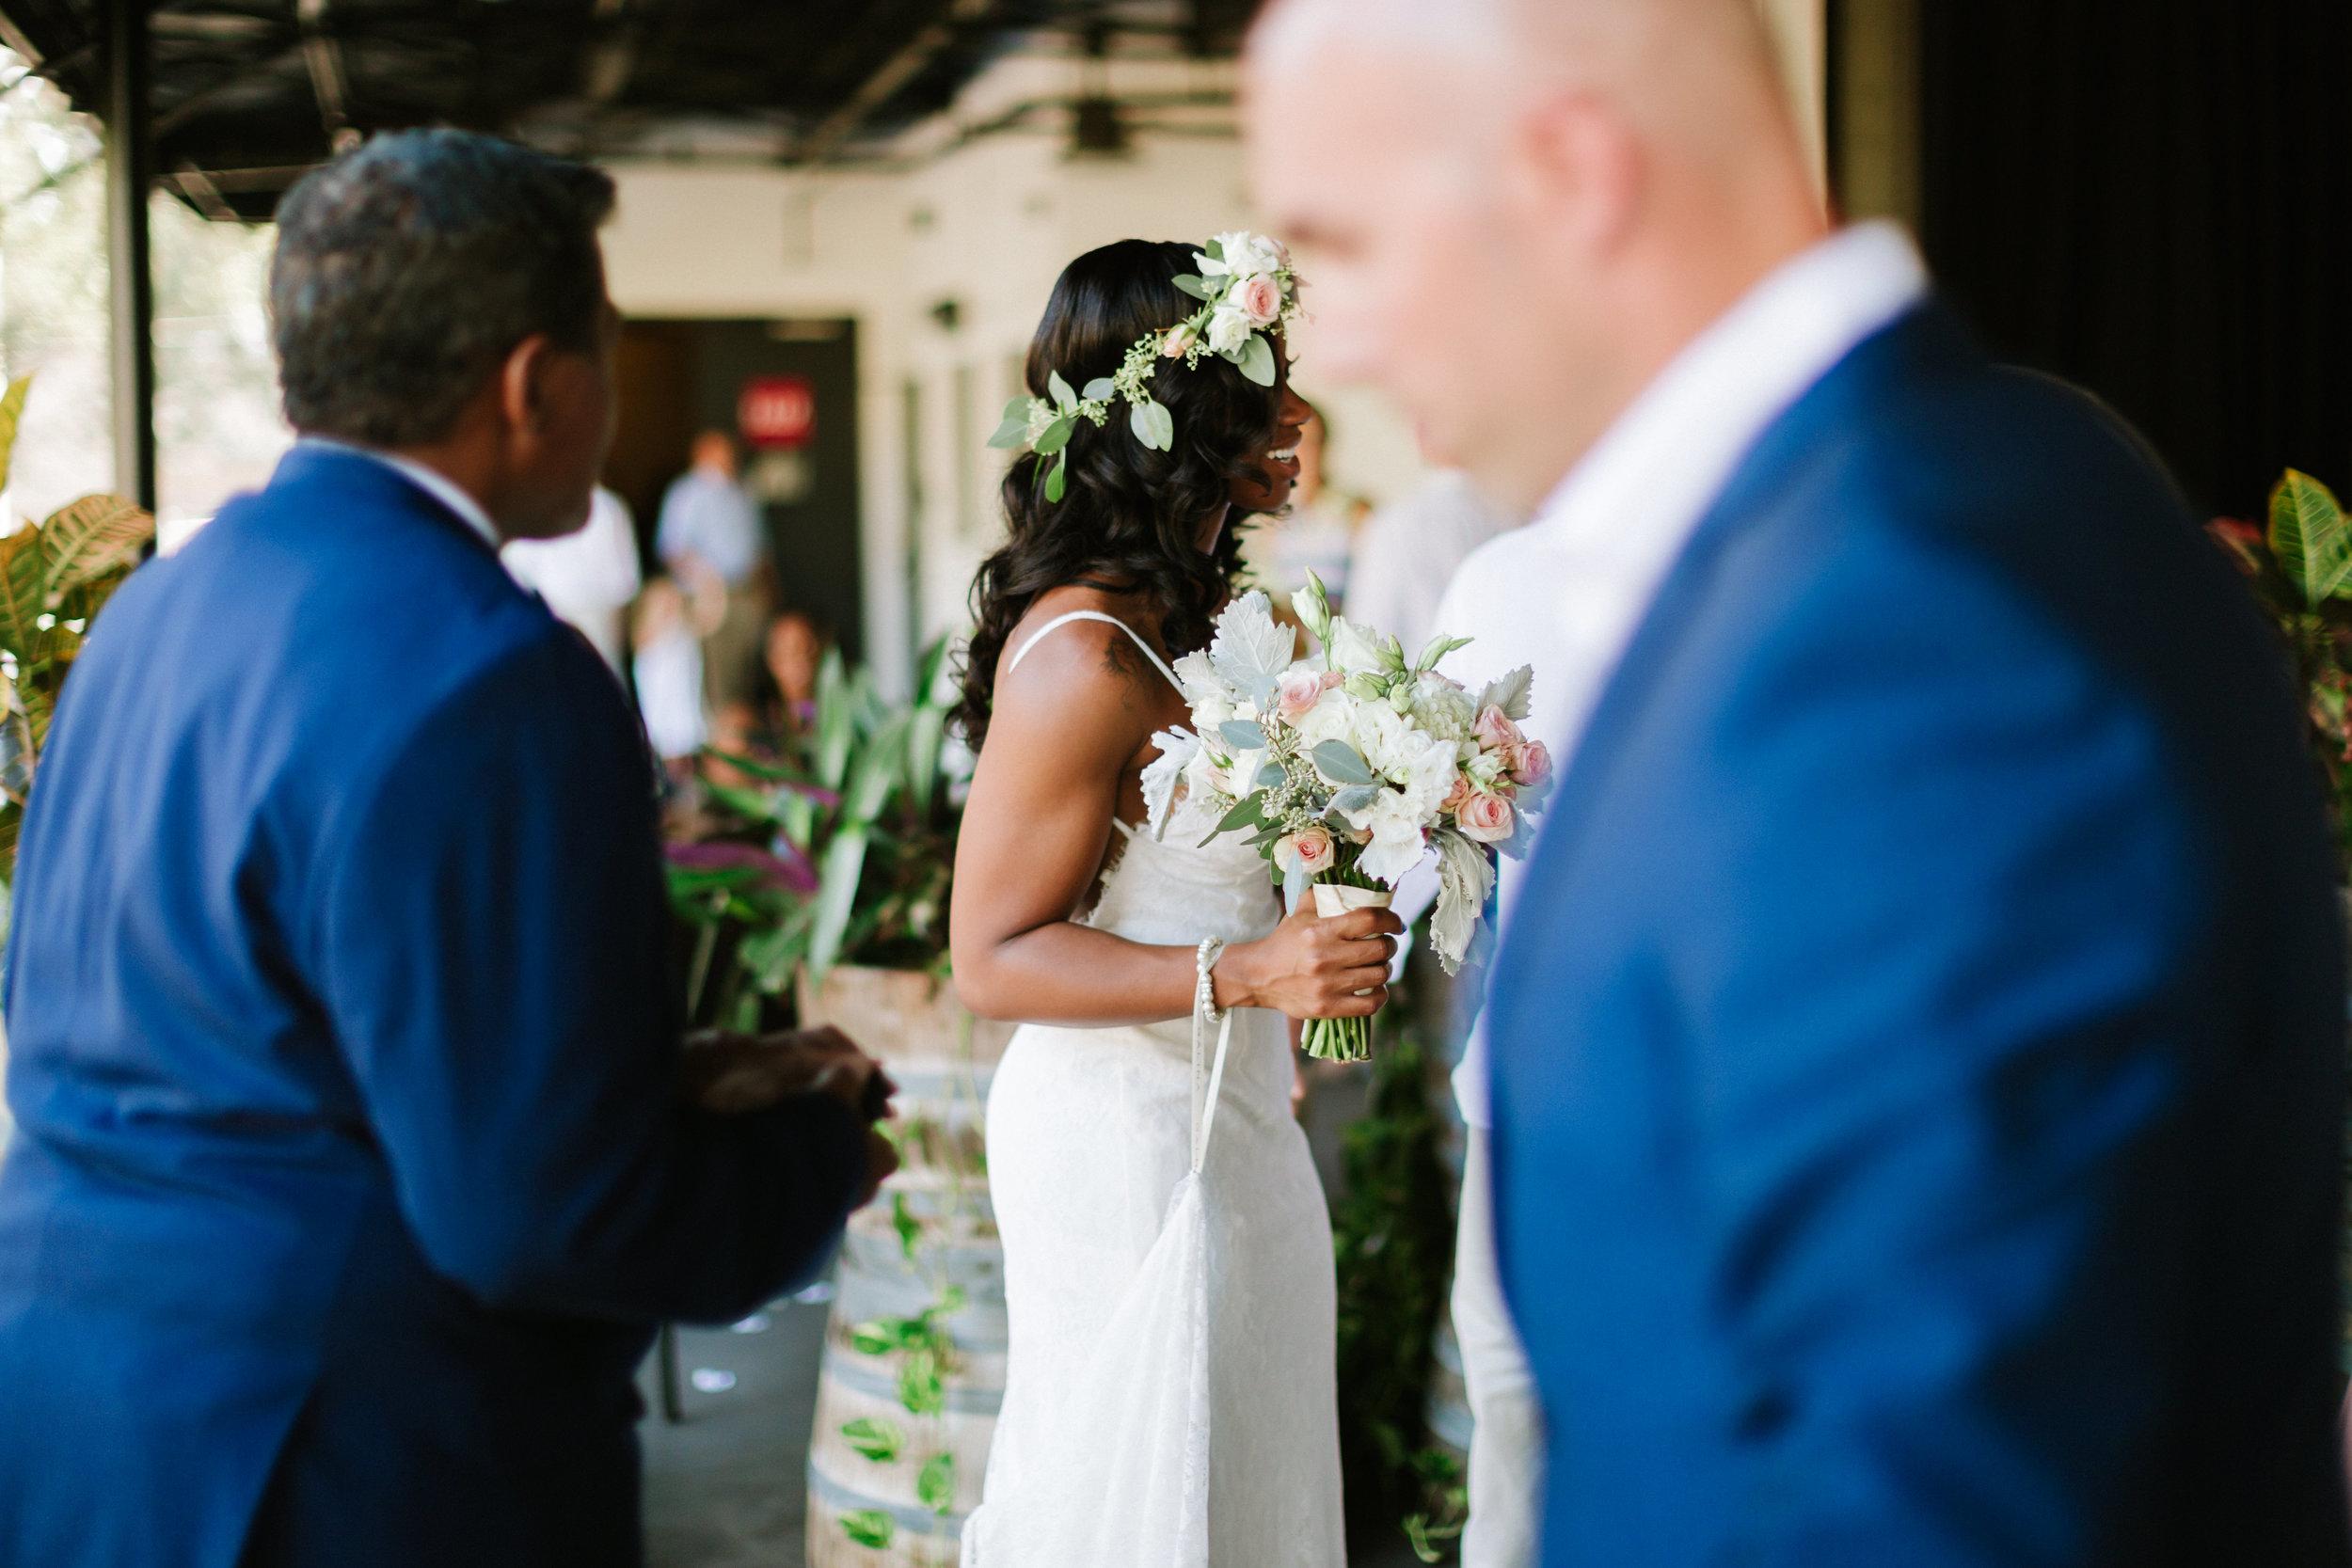 2017.09.16 Ashley and Chuck O'Day Quantam Leap Winery Wedding (273 of 462).jpg